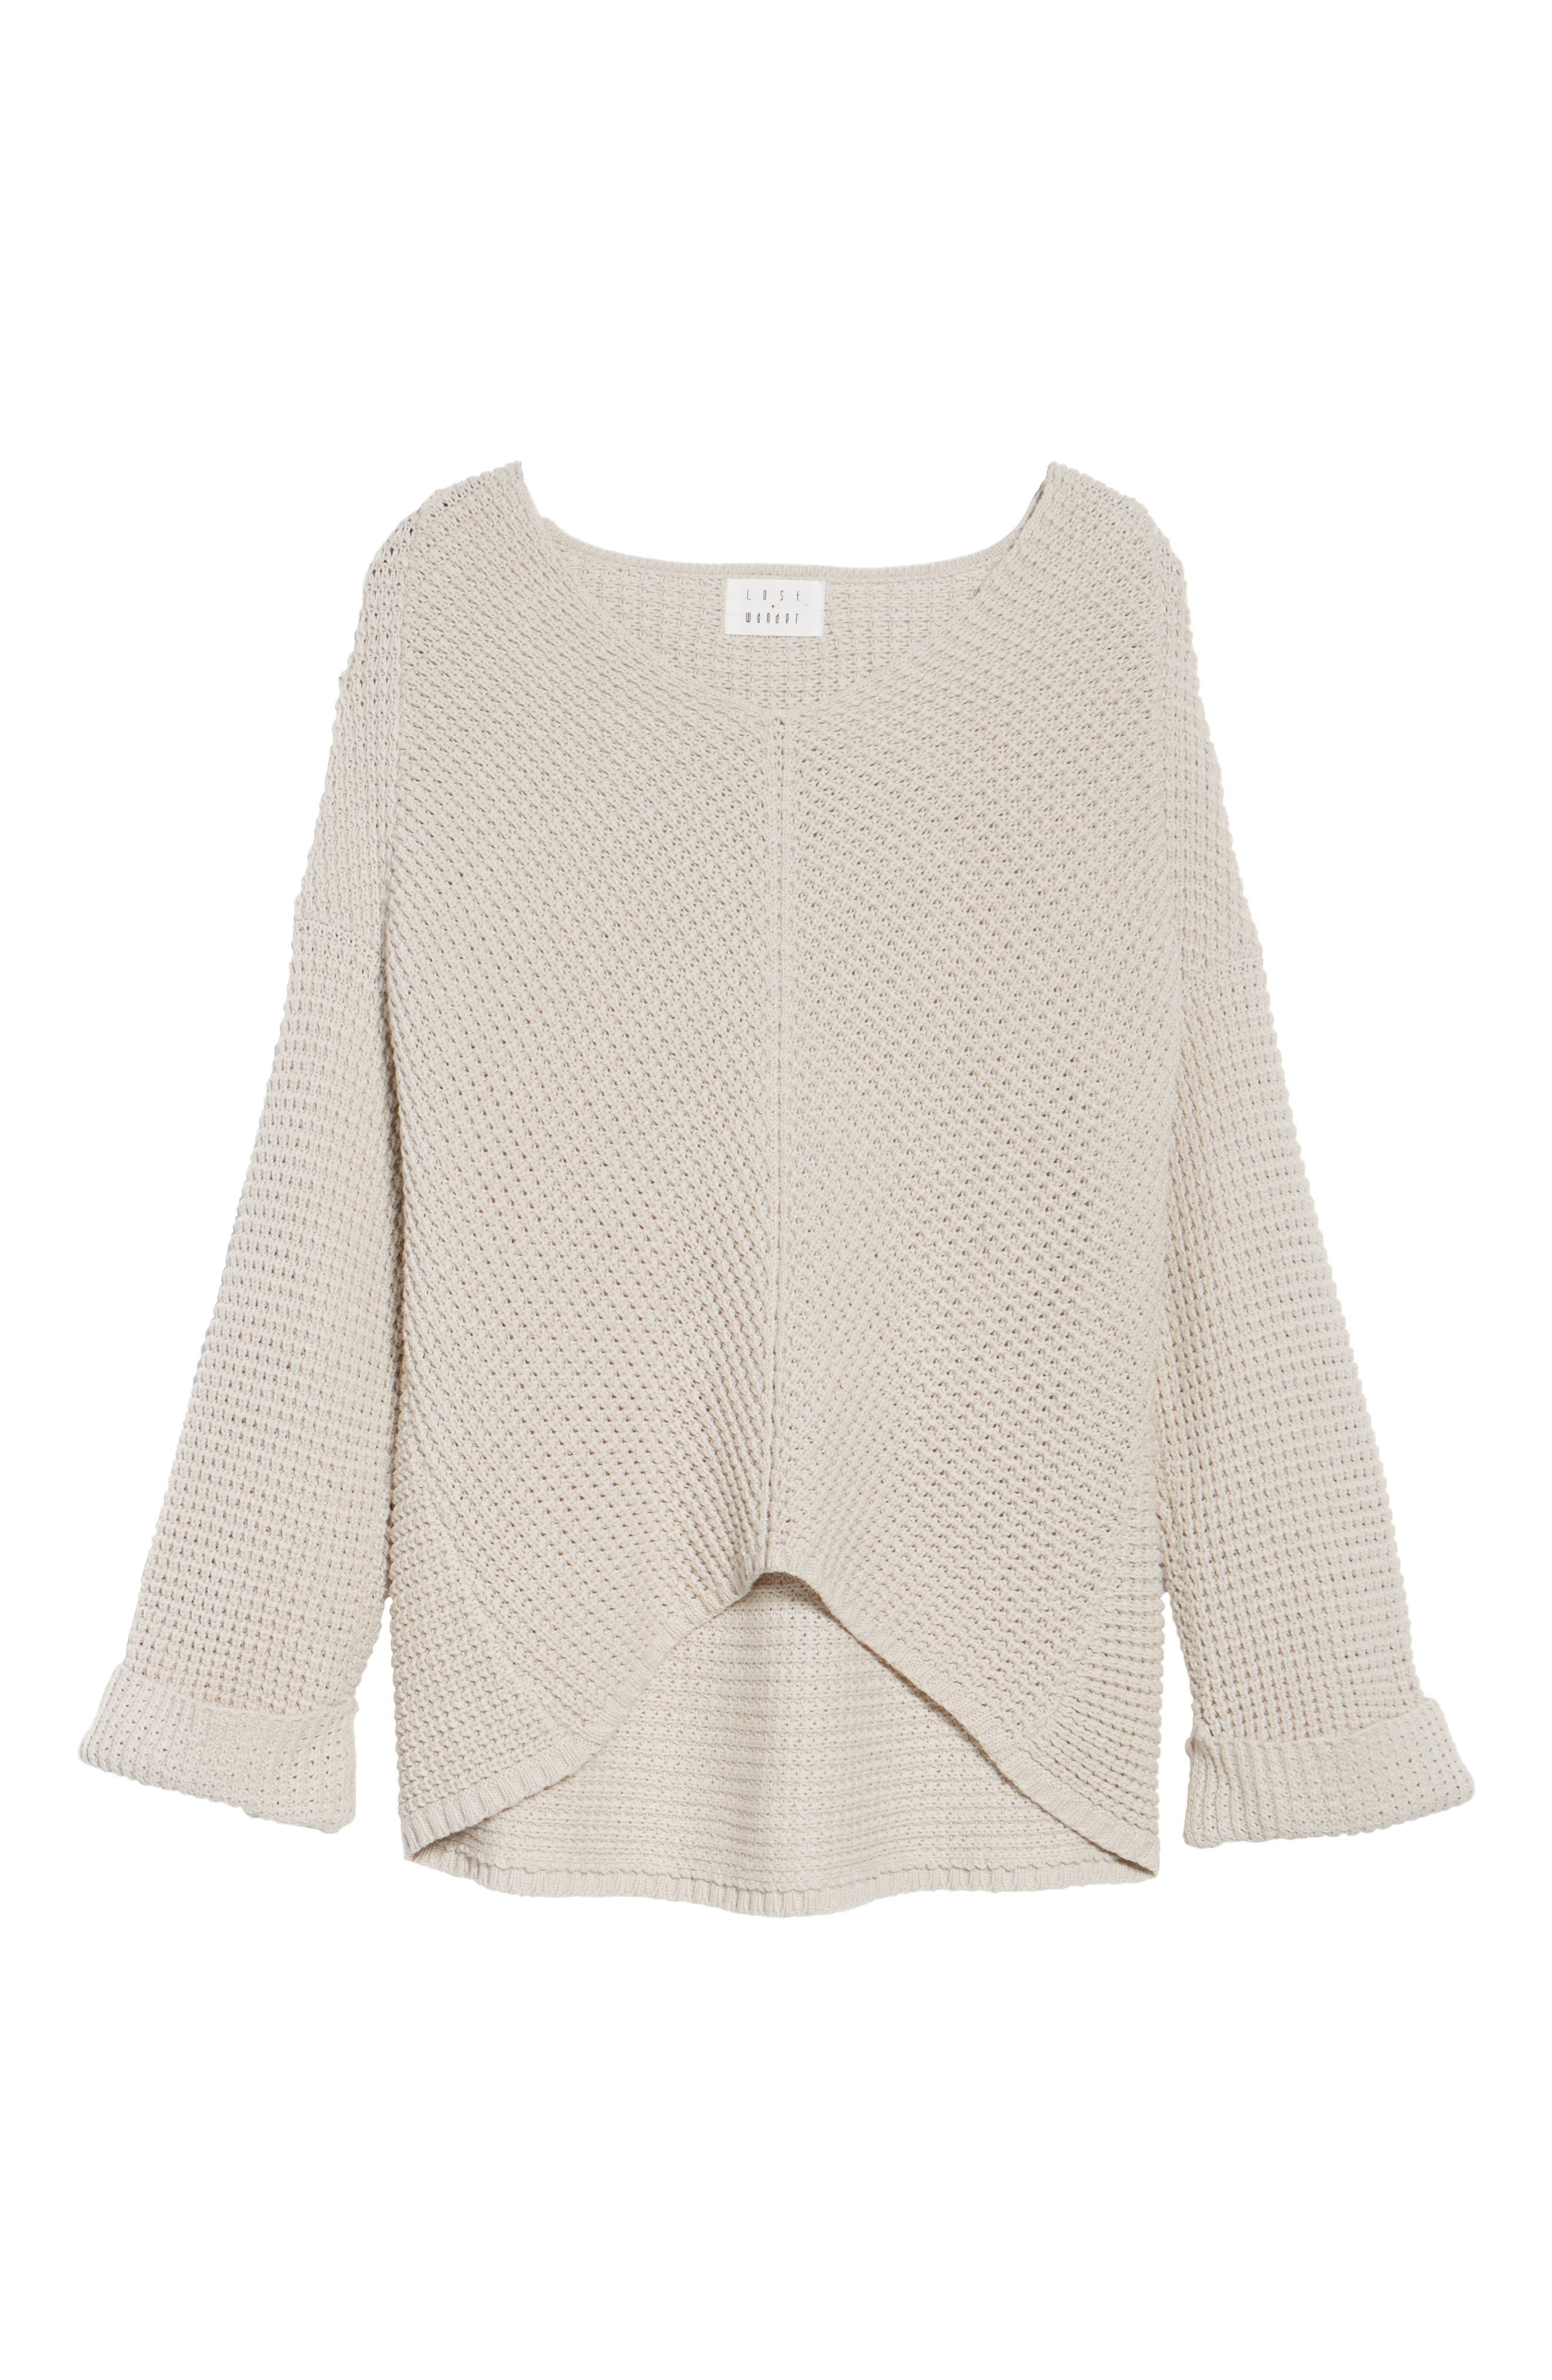 Adelia Bell Sleeve Sweater,                             Alternate thumbnail 6, color,                             900